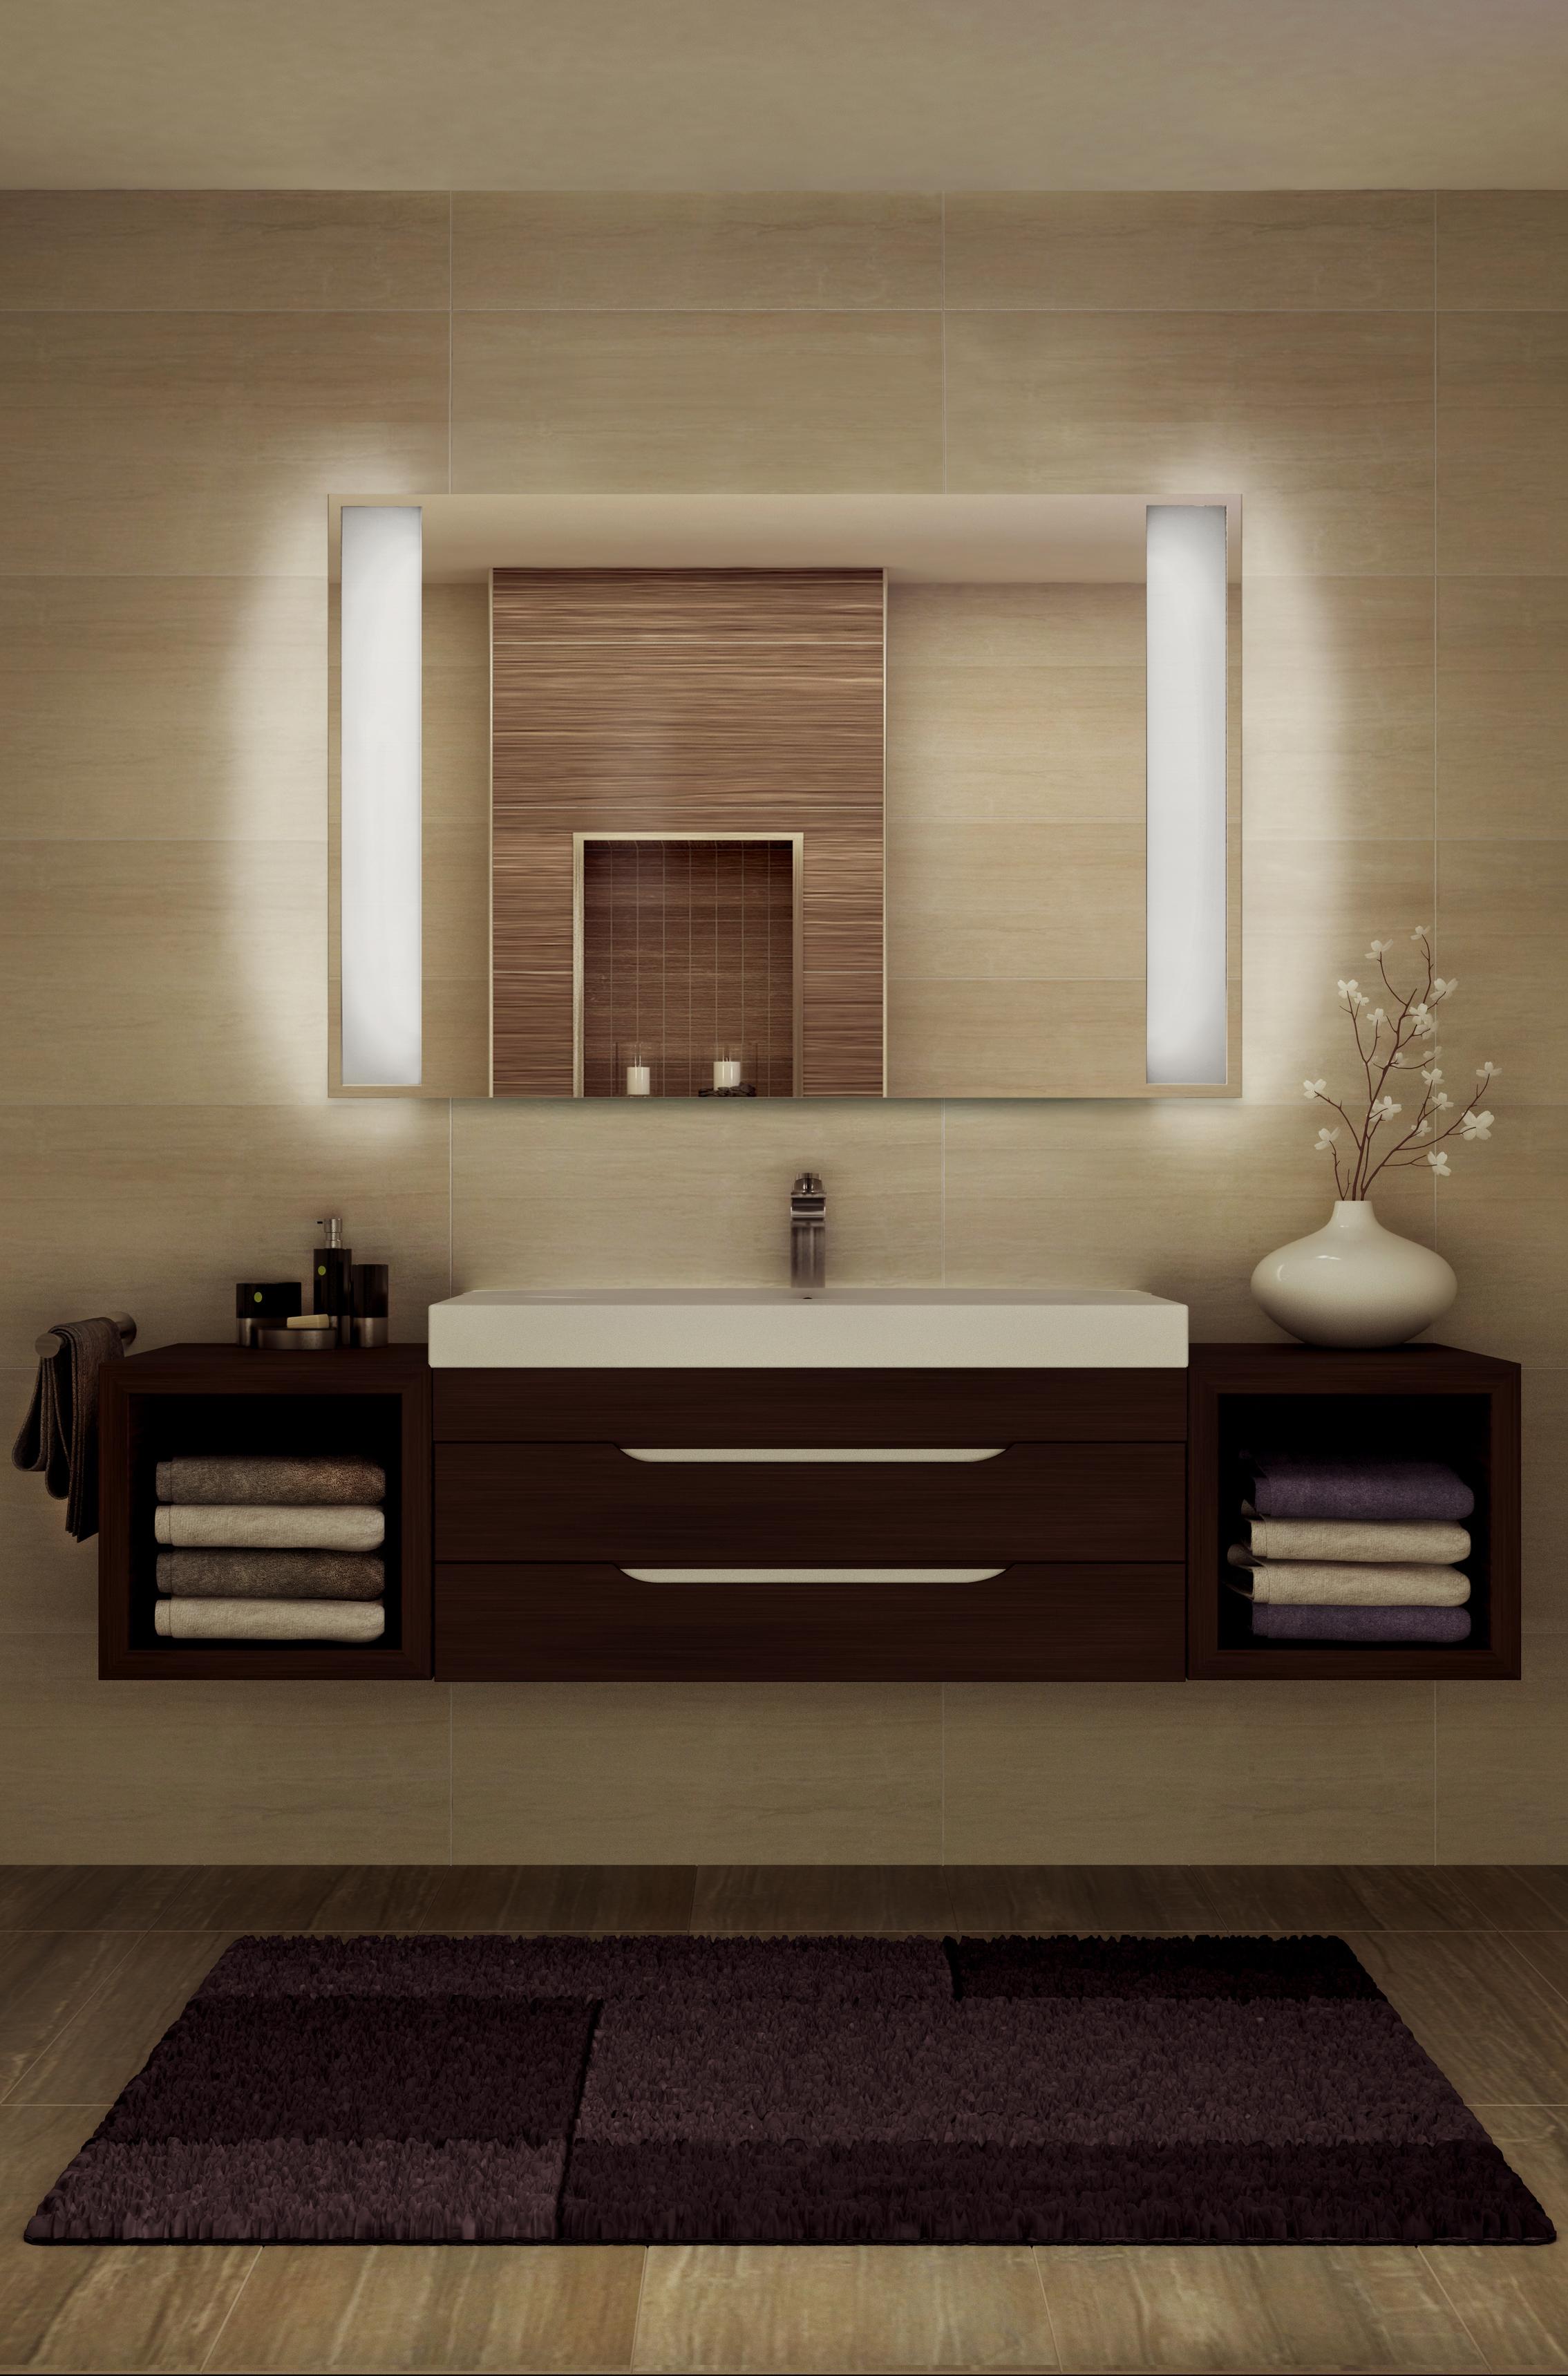 Varme på bad med speil med lys i